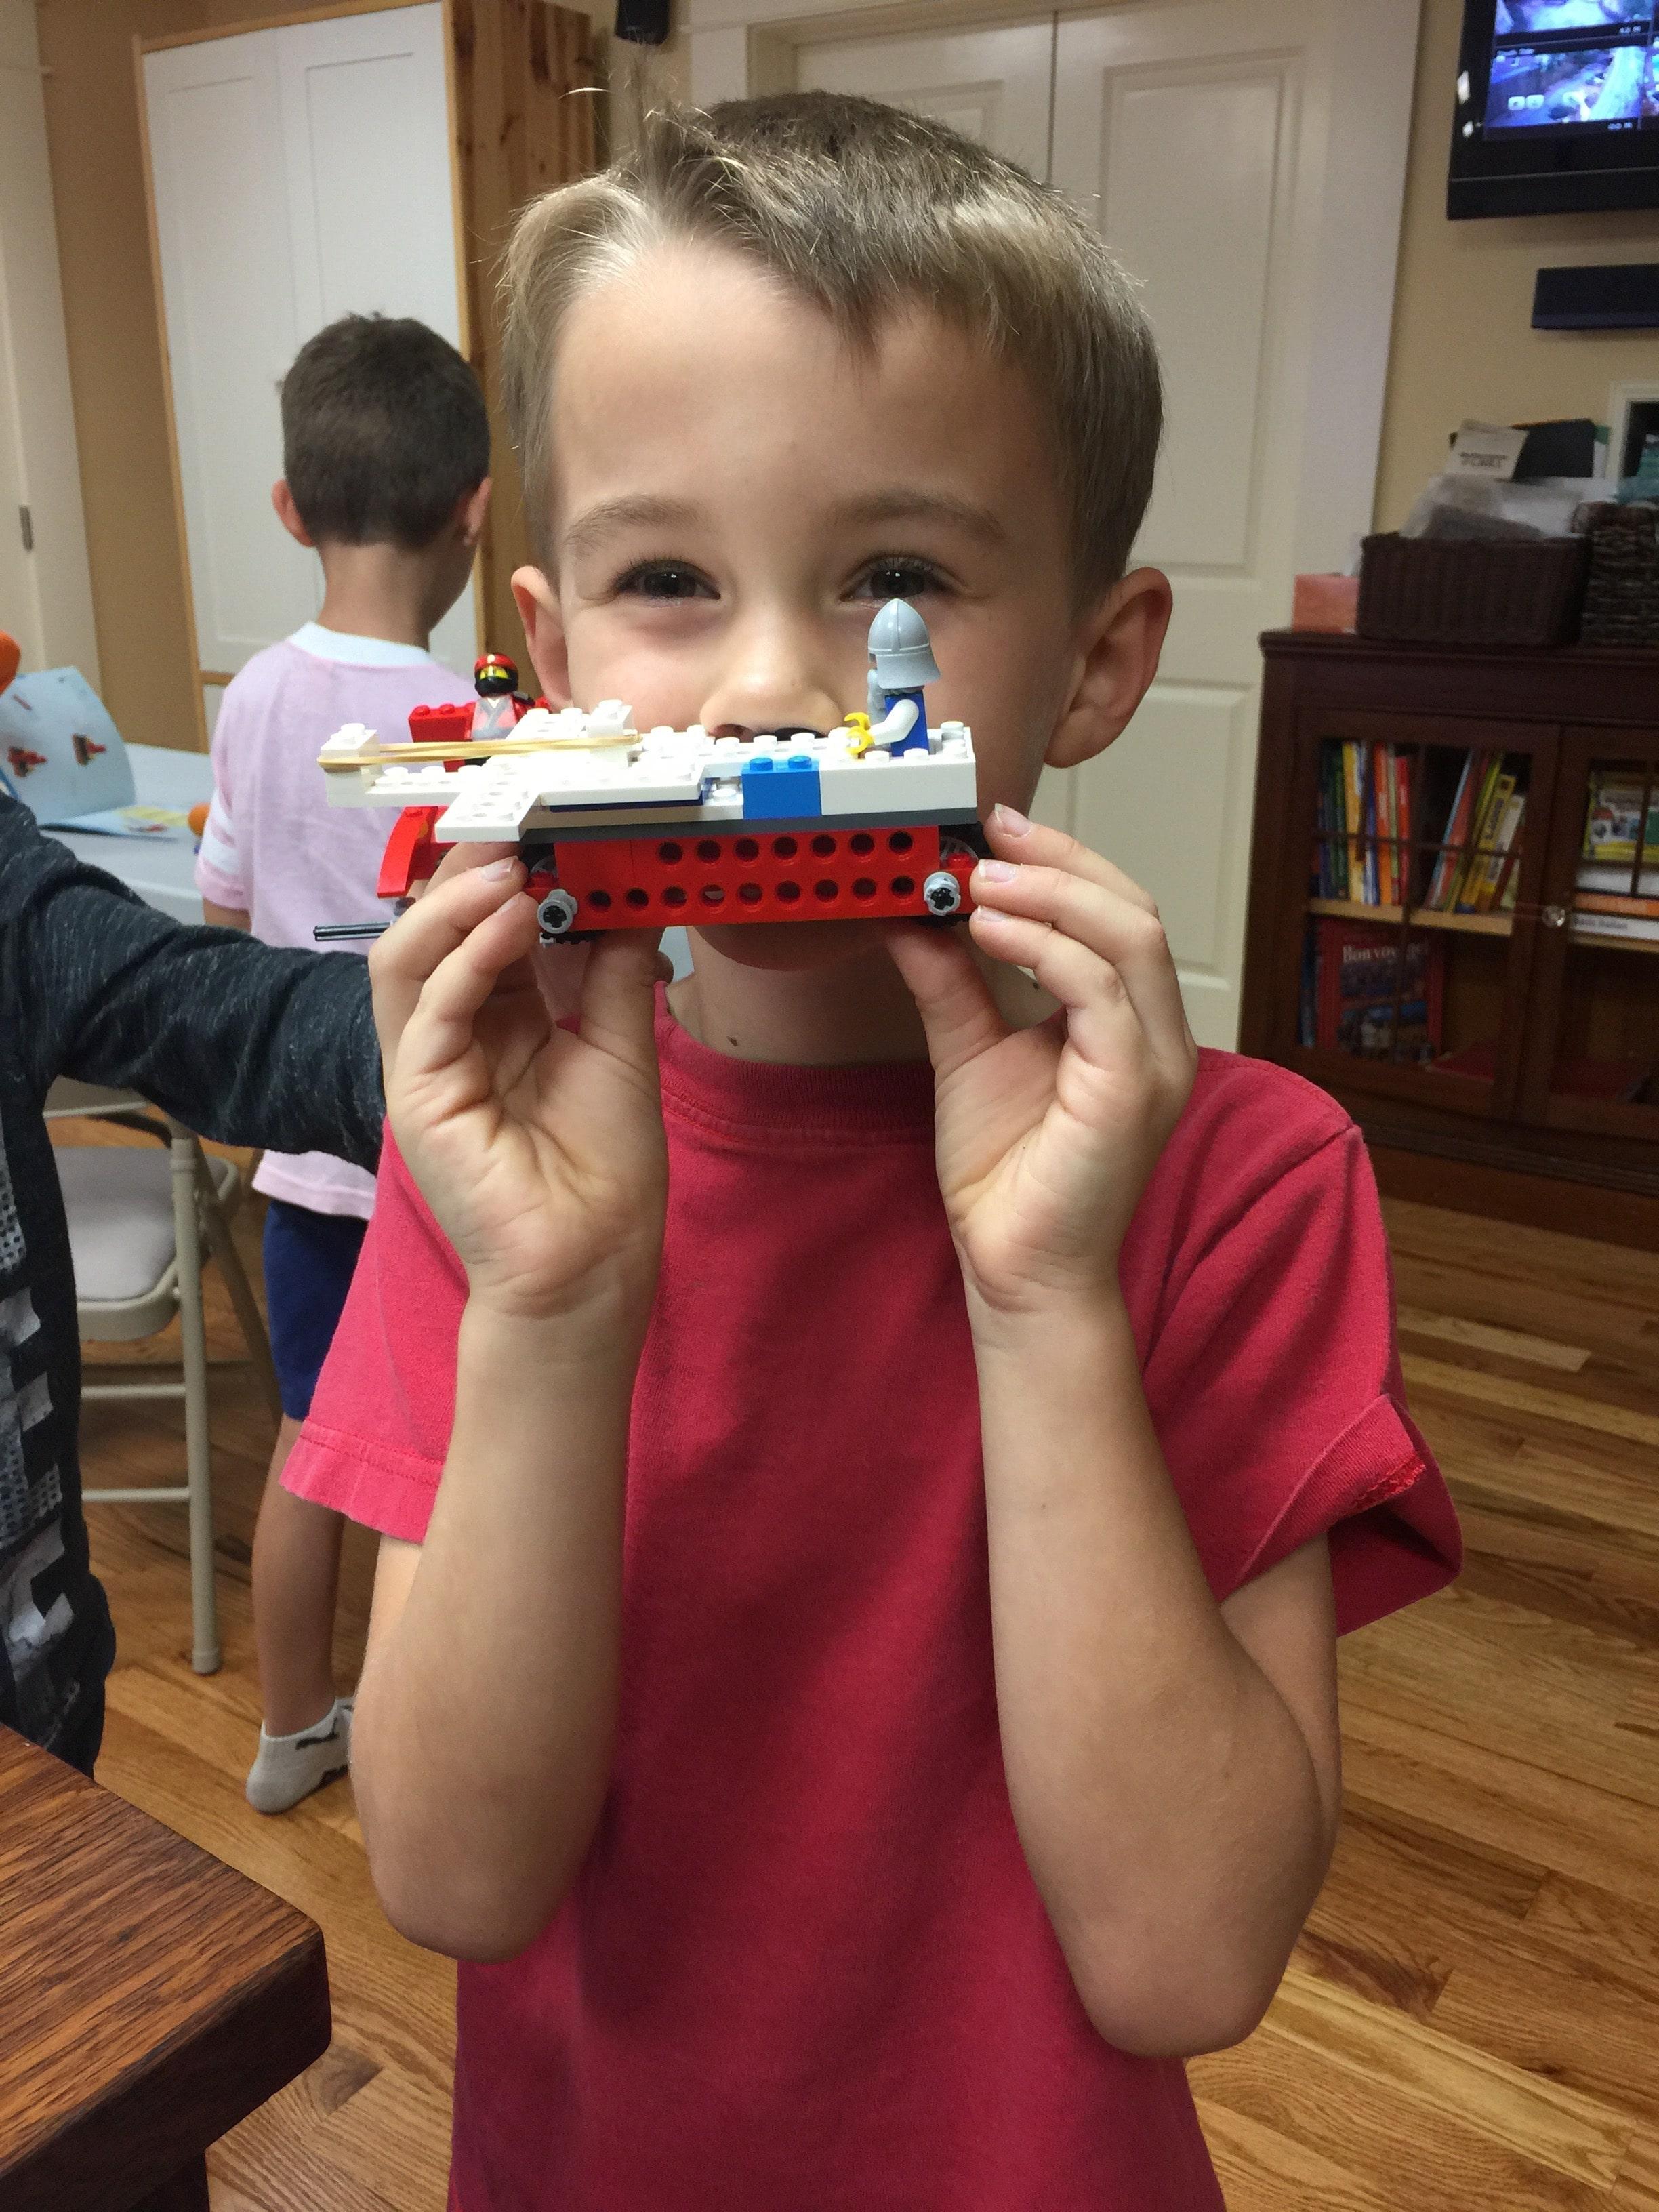 Boy in Atlanta class with Lego Robotics project